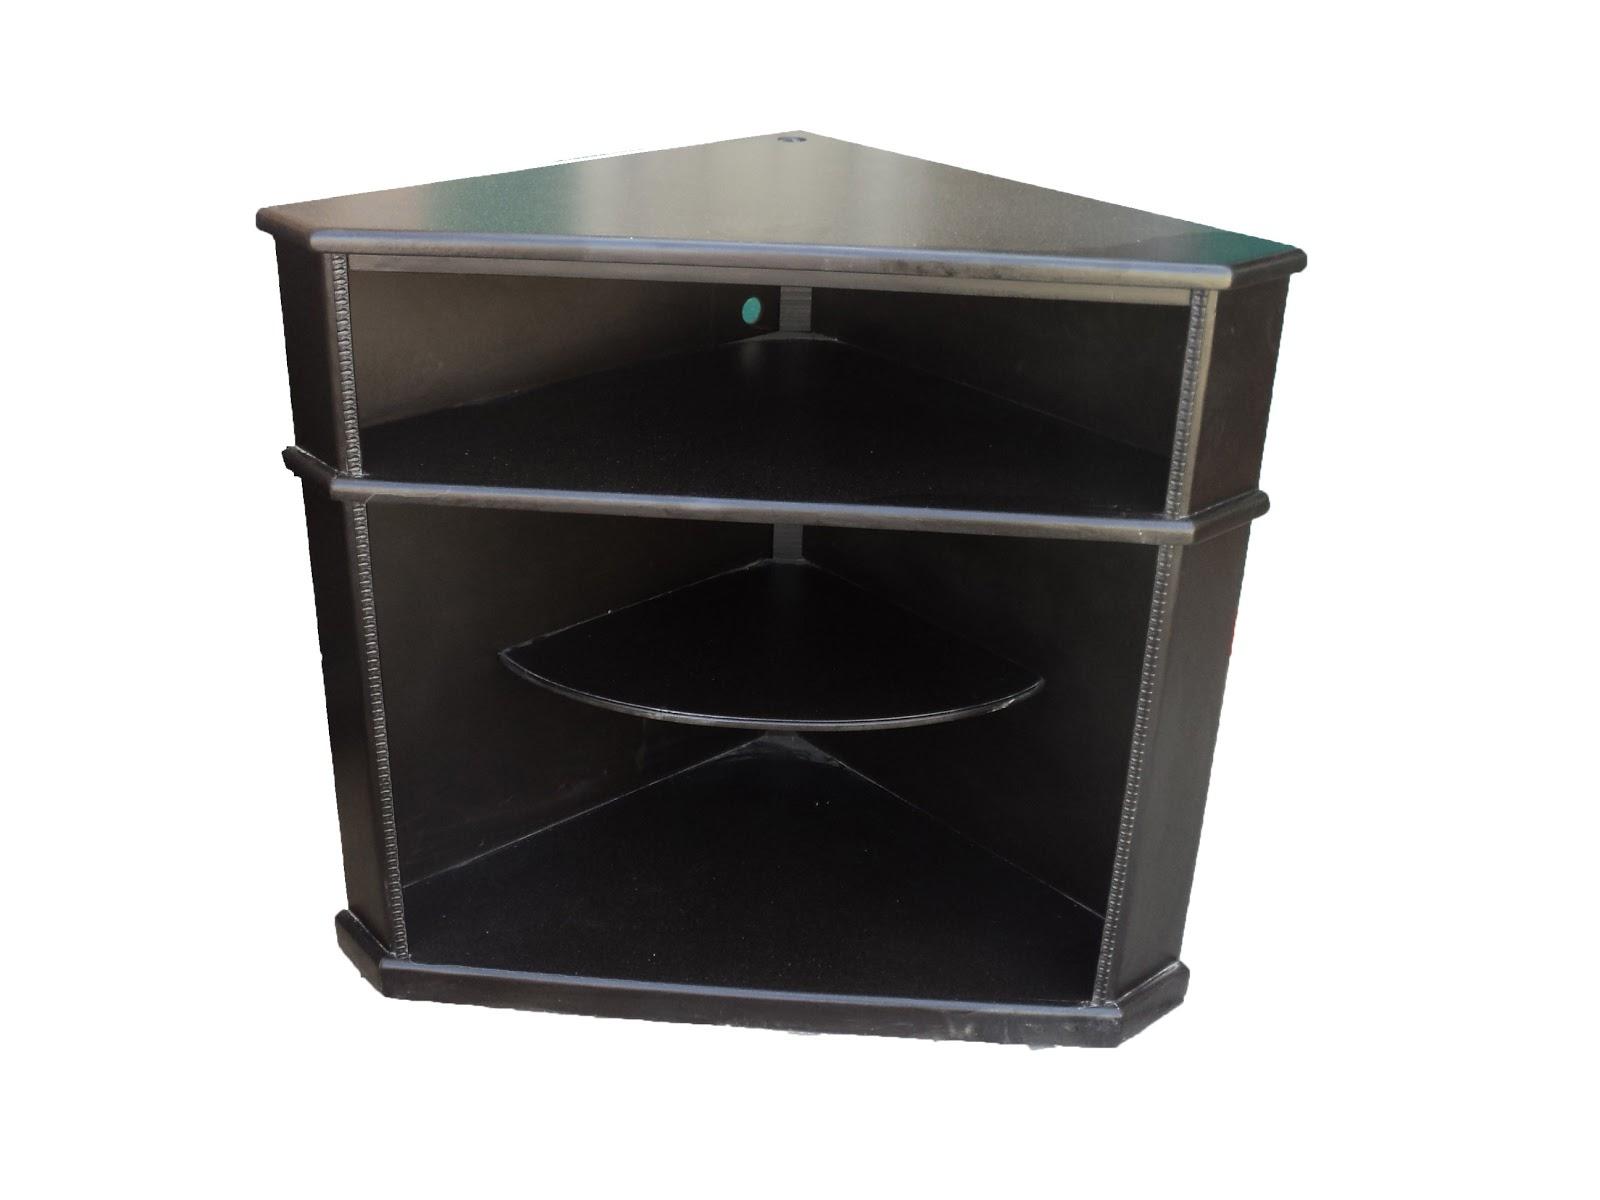 Centros entretenimiento para muebles minimalistas modernos - Muebles para tv modernos ...